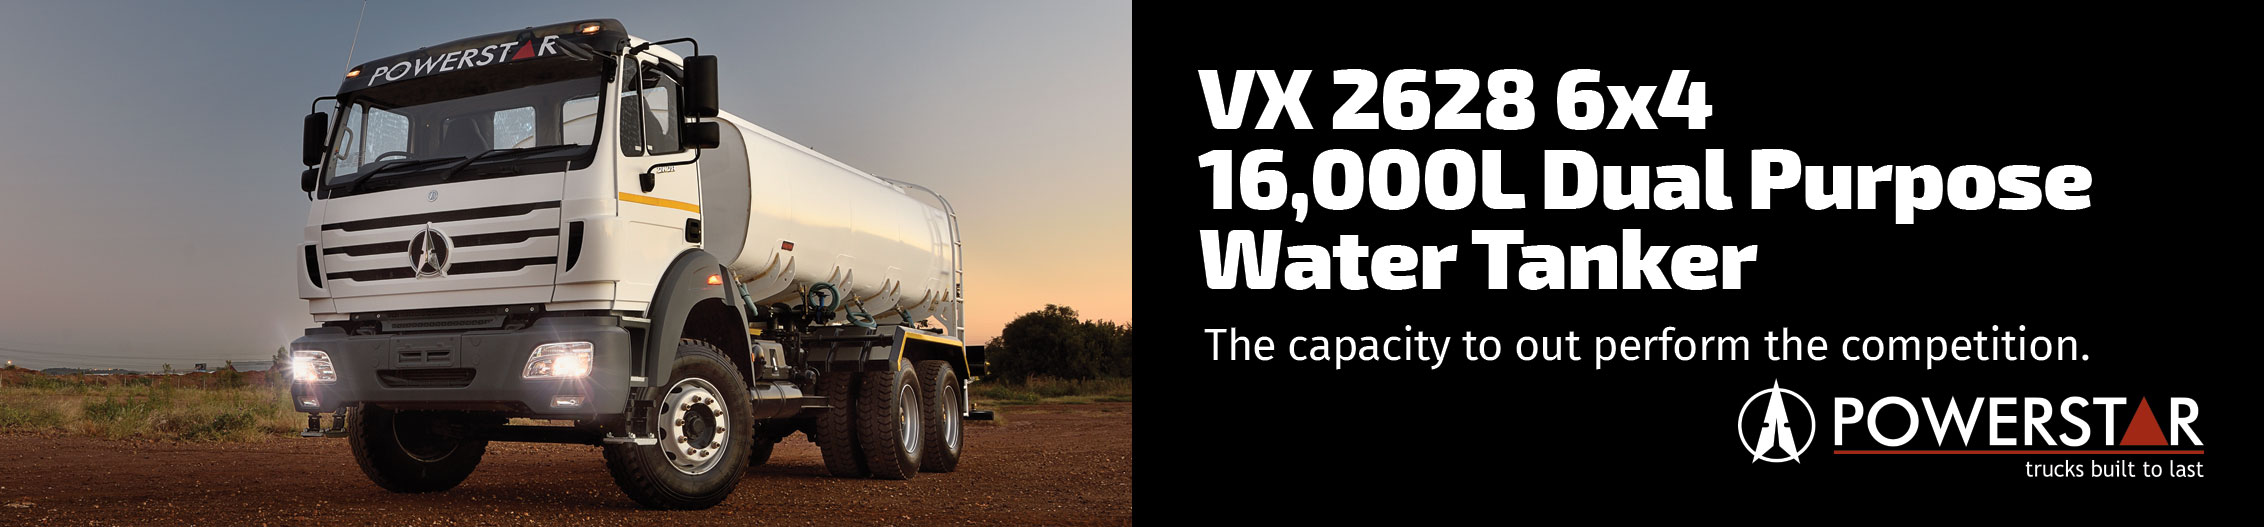 Powerstar-VX2628-Tanker-truck-centre-durban-promotions